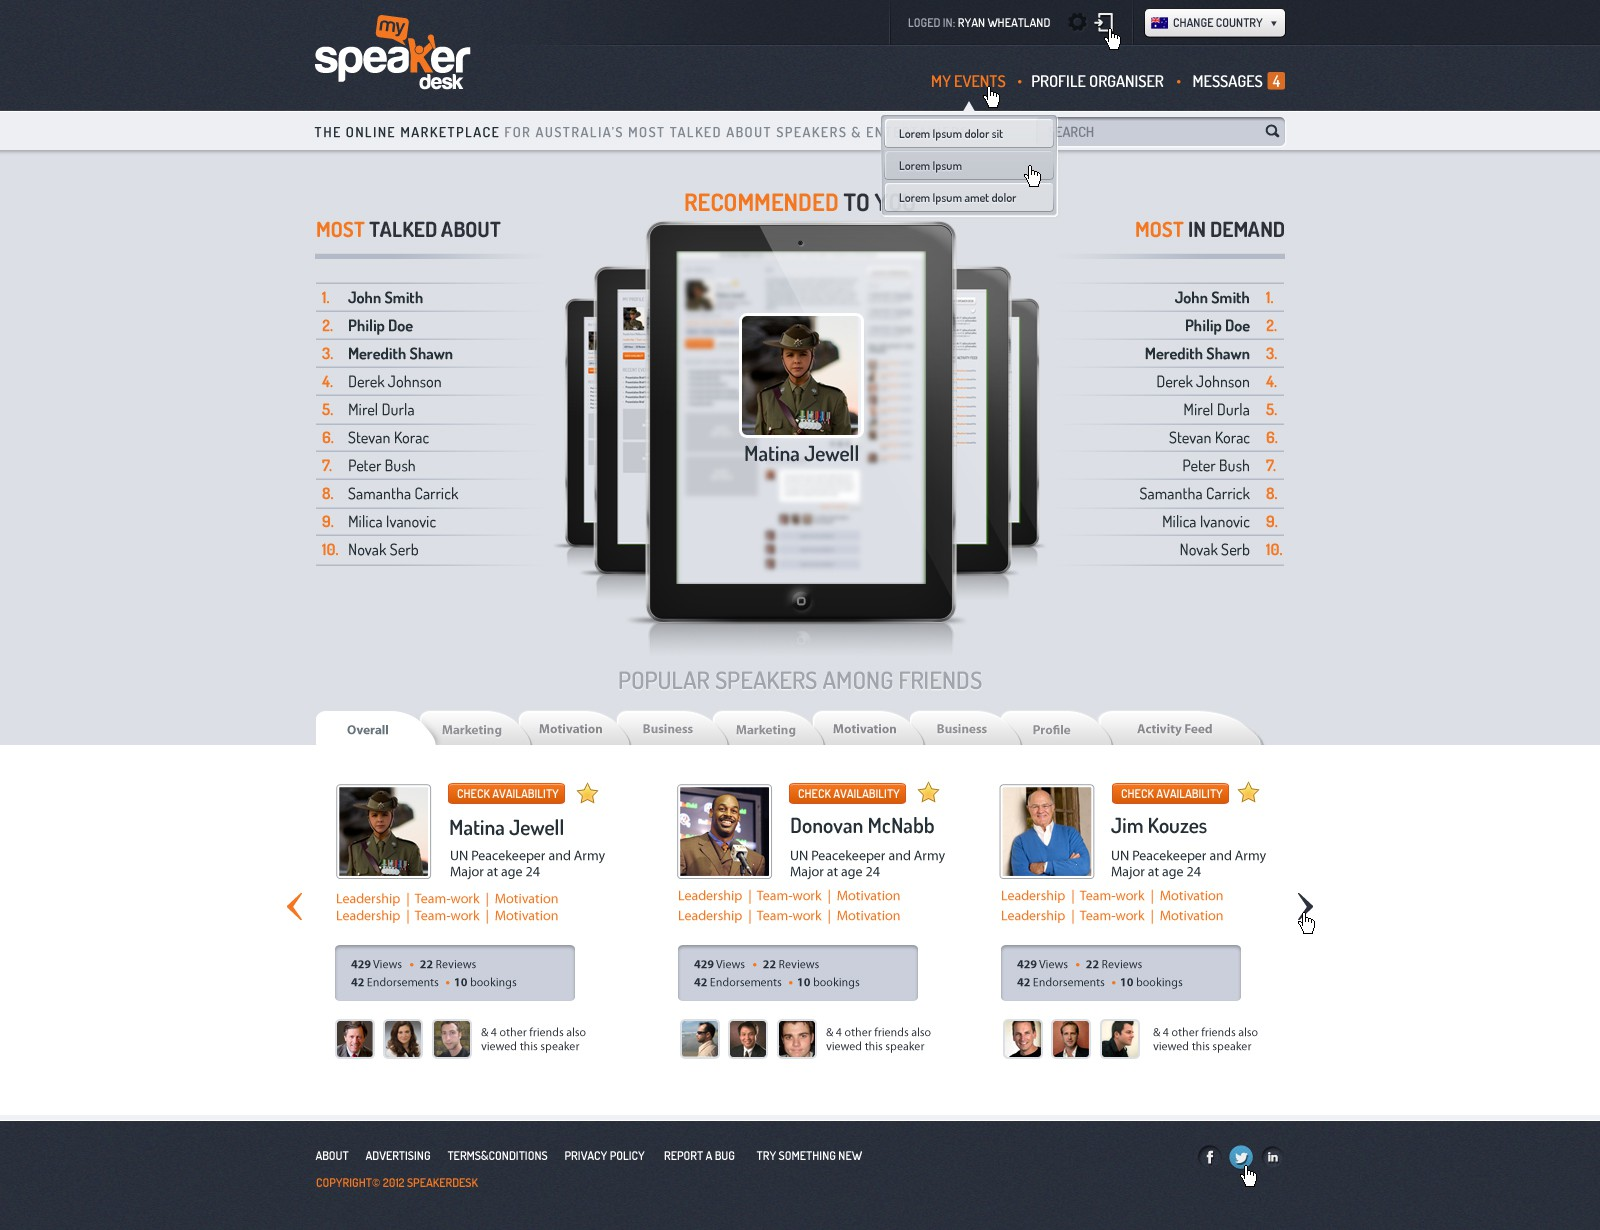 MySpeakerDesk needs a new website design